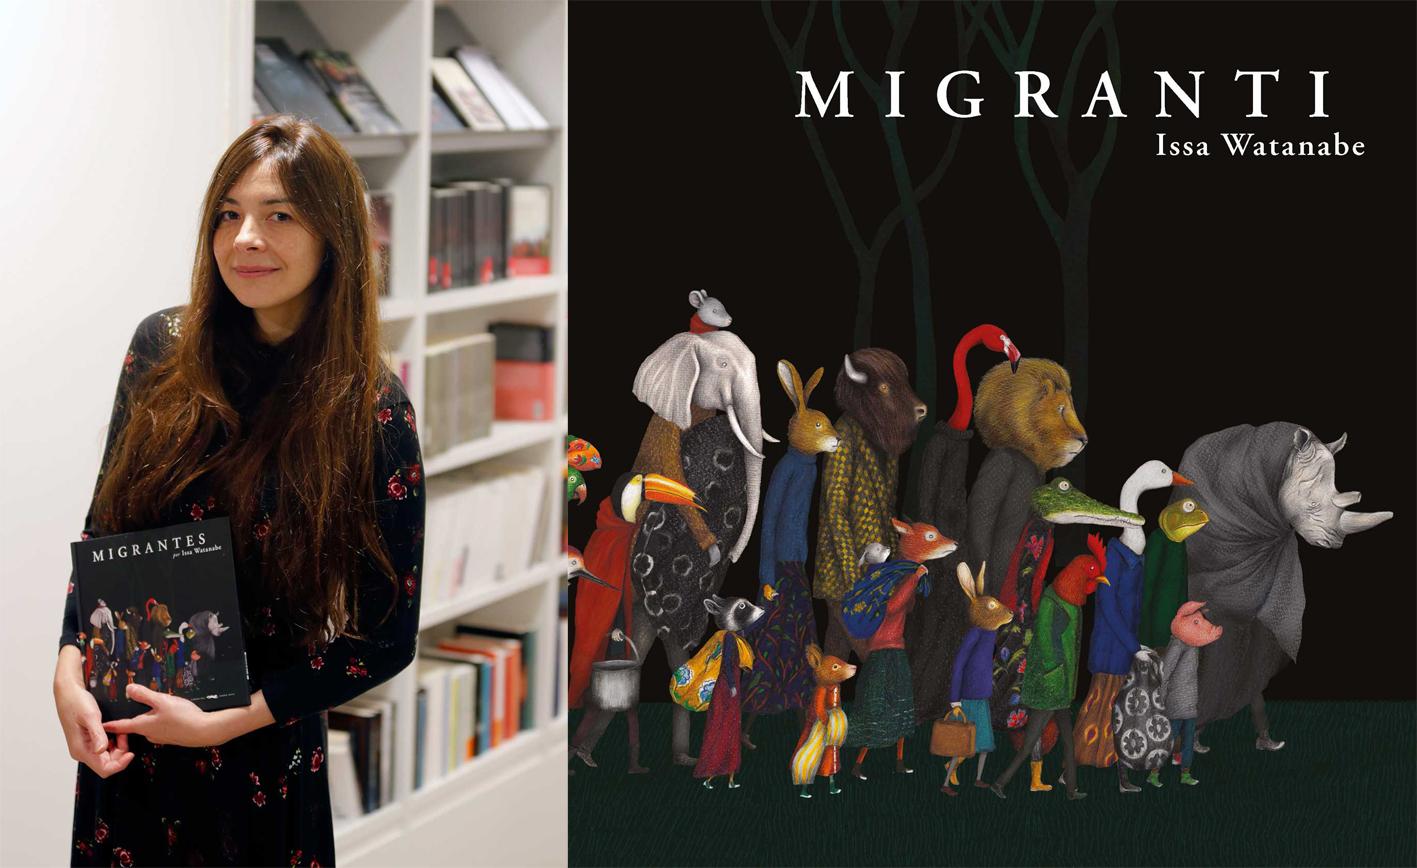 Migranti di Issa Watanabe